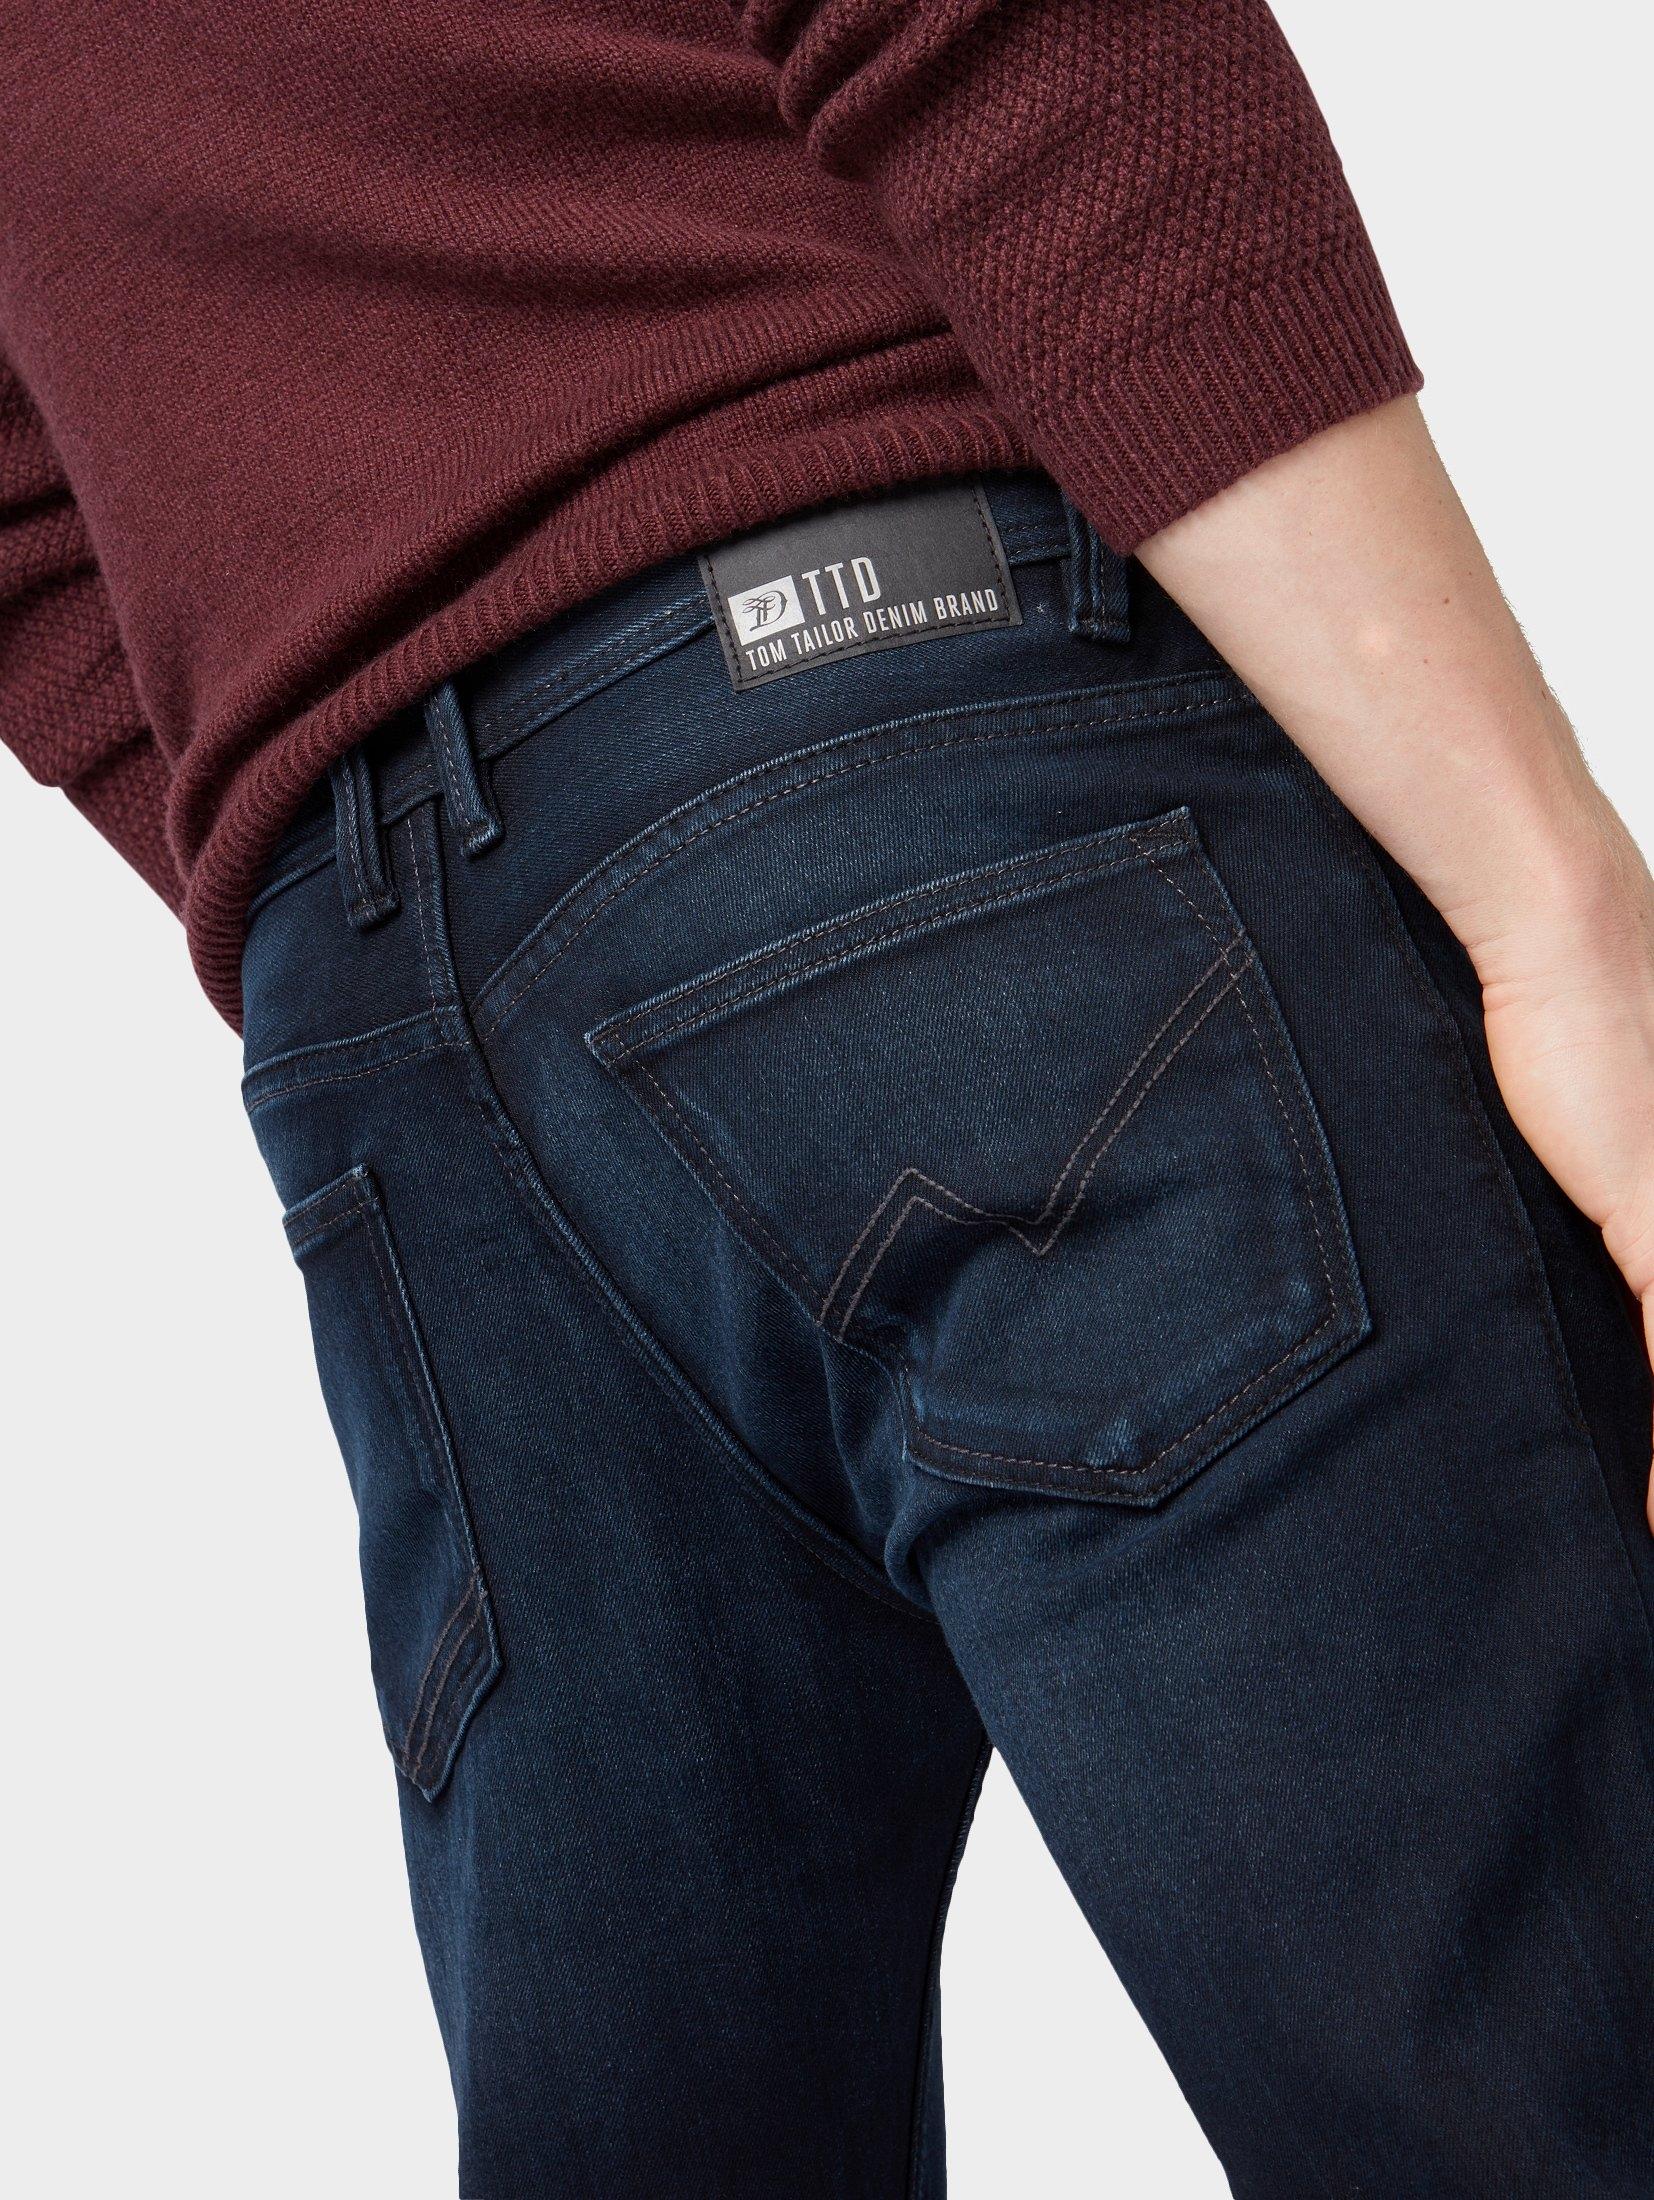 Tom Winkel Denim Jeansaedan De Slim In Online Tailor Fit Jeans Kc3TF1lJ